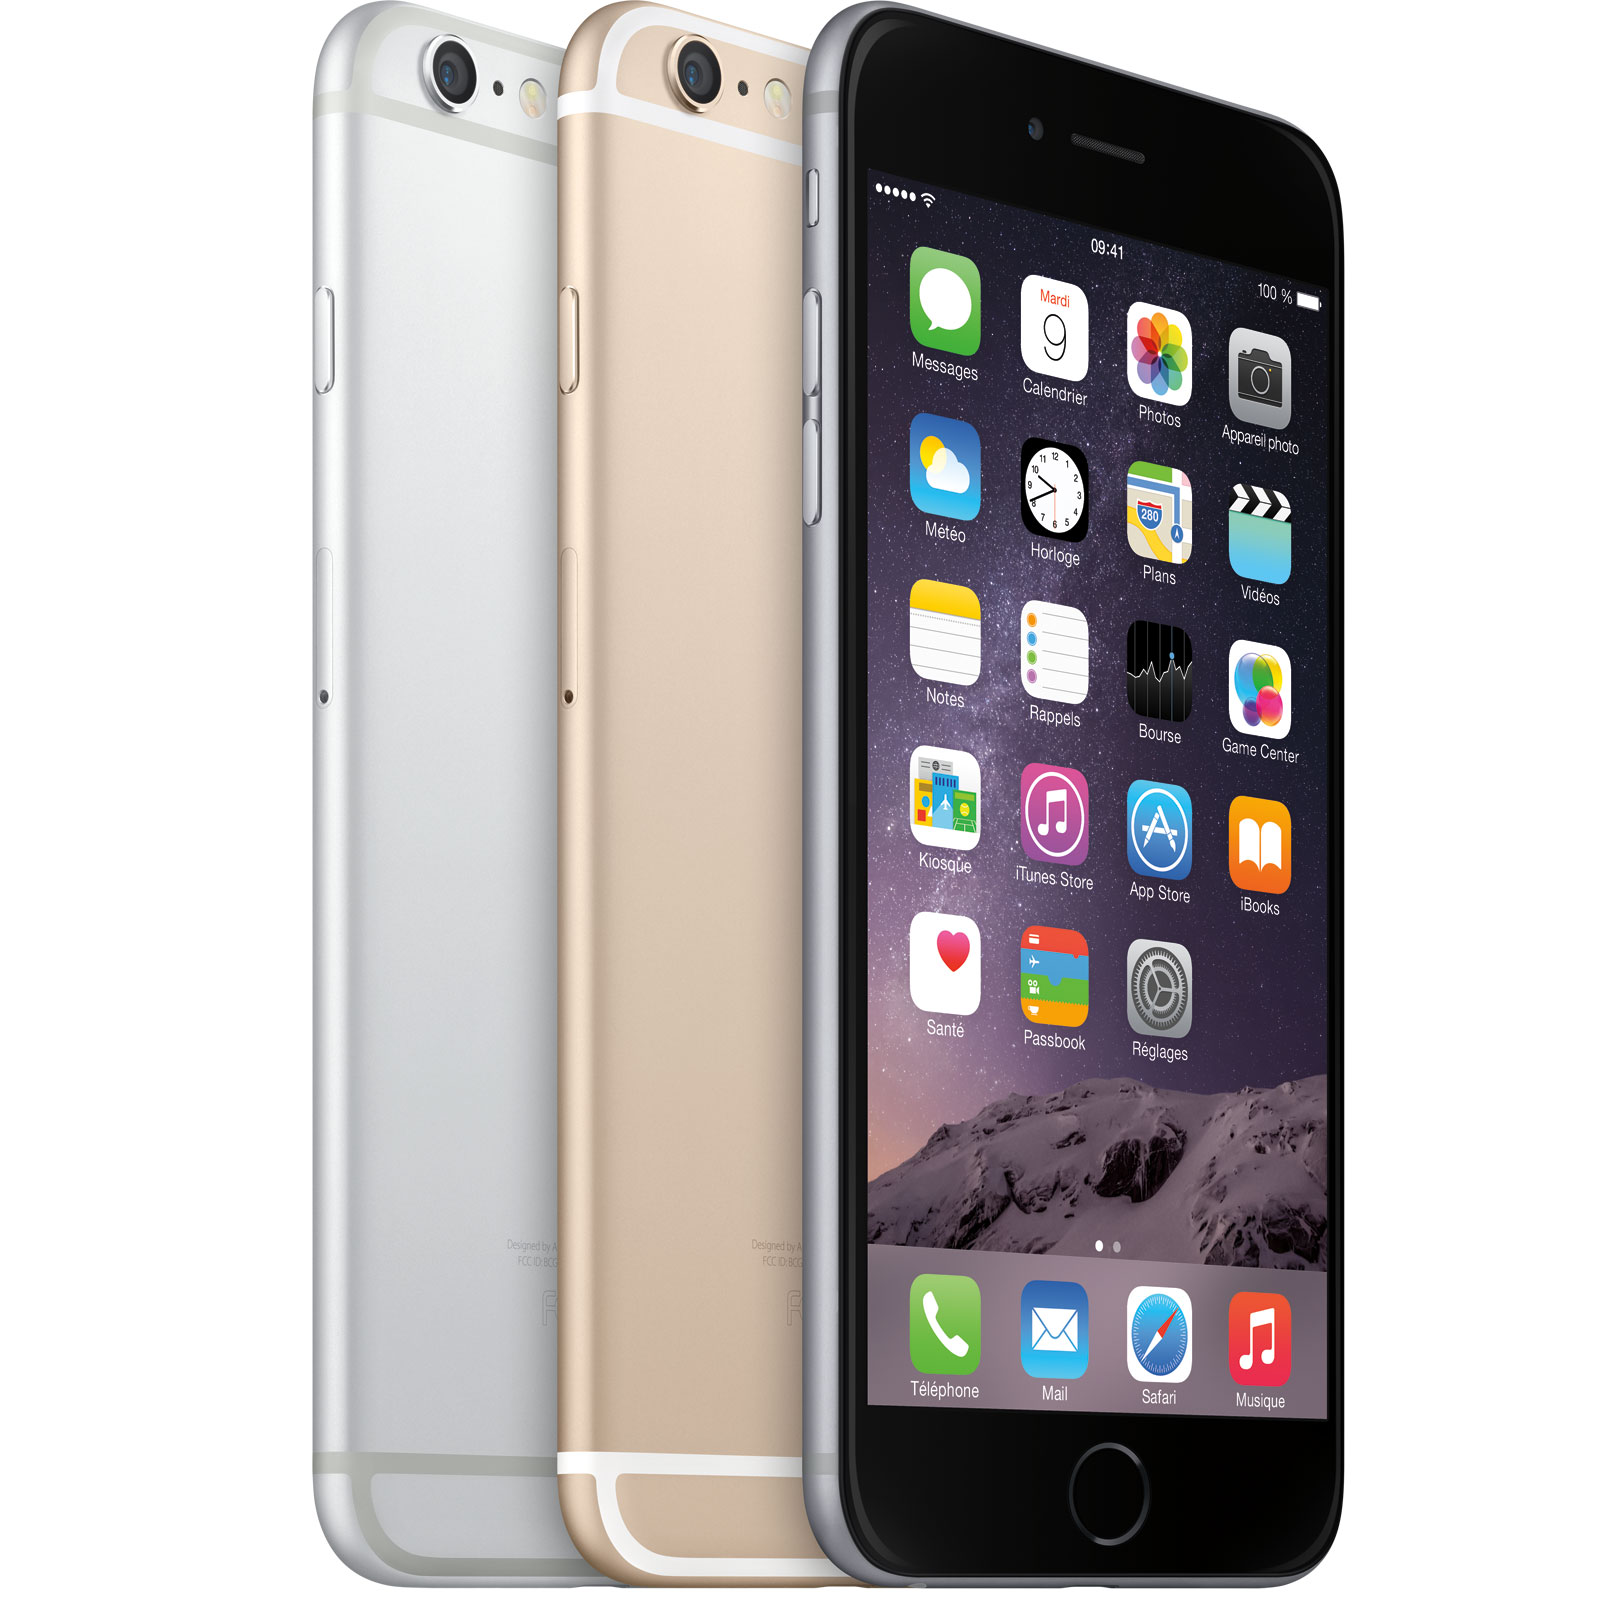 apple iphone 6 plus 64 go gris sid ral mobile smartphone apple sur ldlc. Black Bedroom Furniture Sets. Home Design Ideas